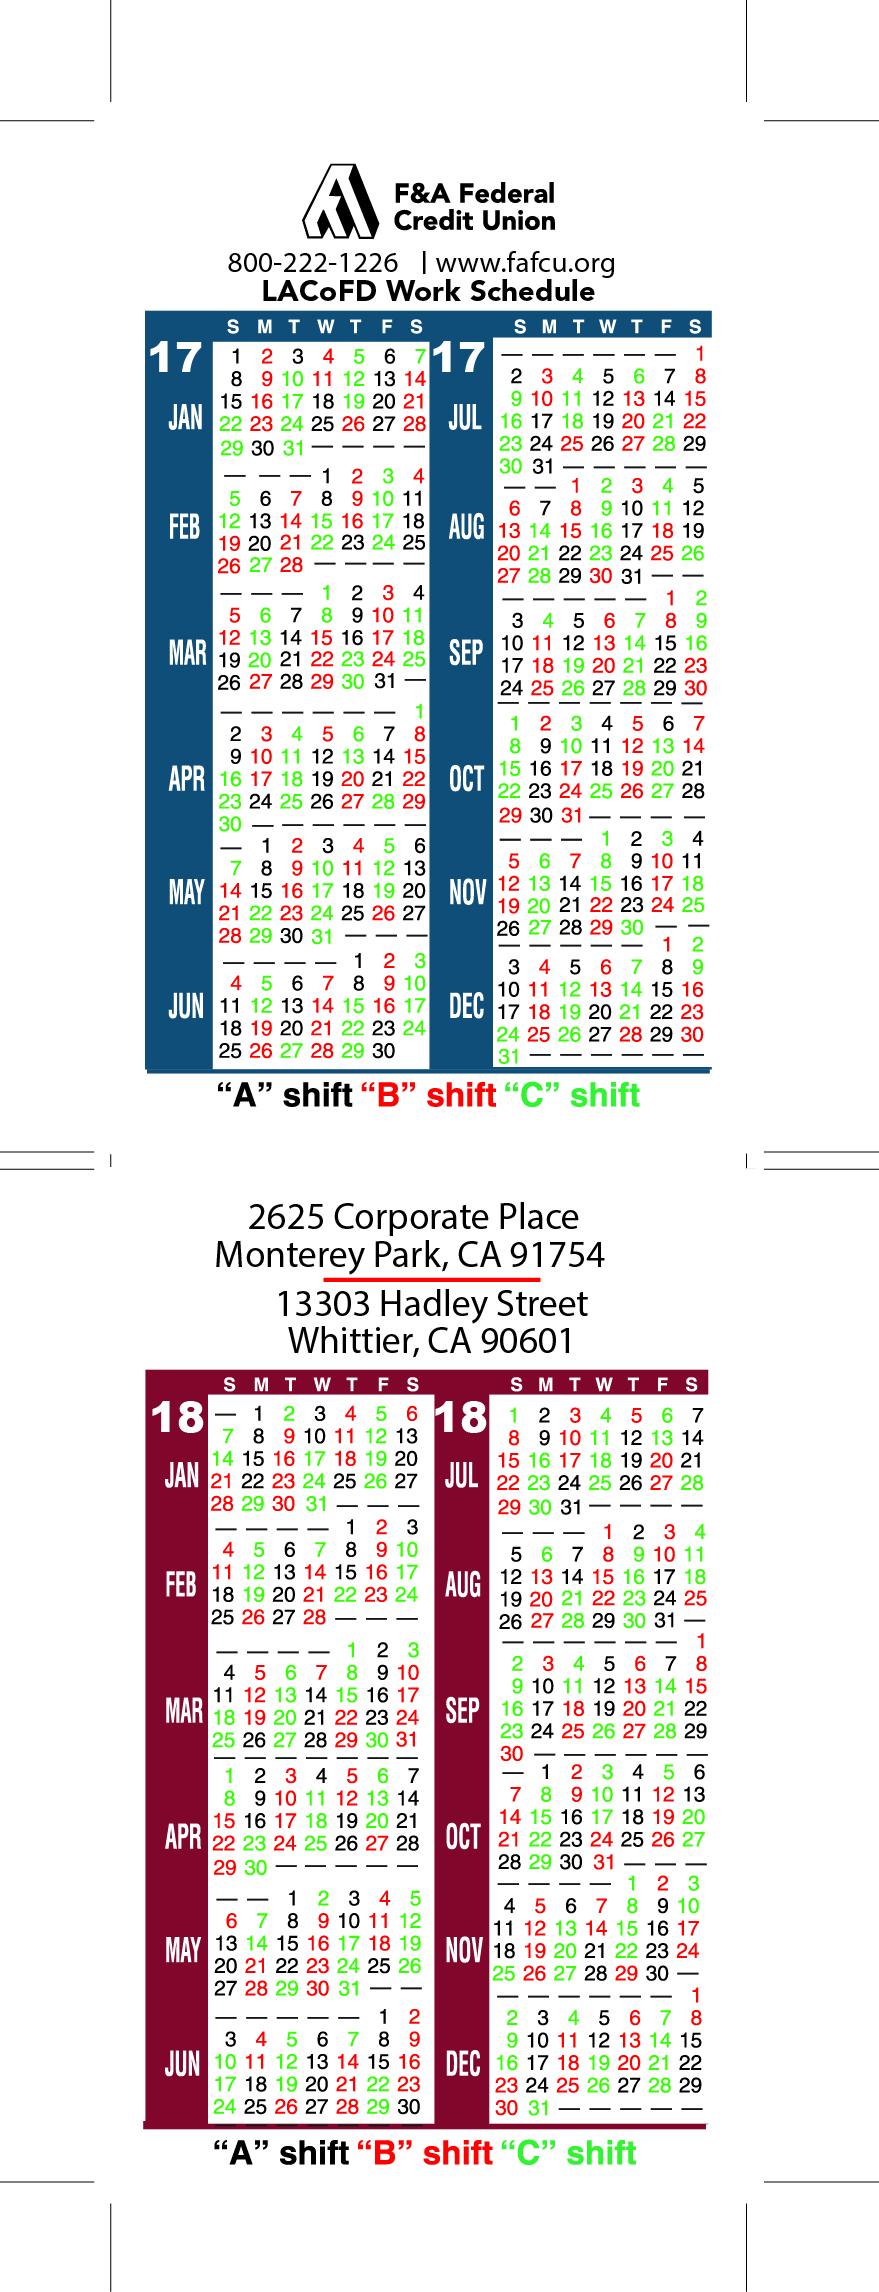 Houston Fire Department Shift Calendar   Printable in 2022 Hfd Shift Calendar